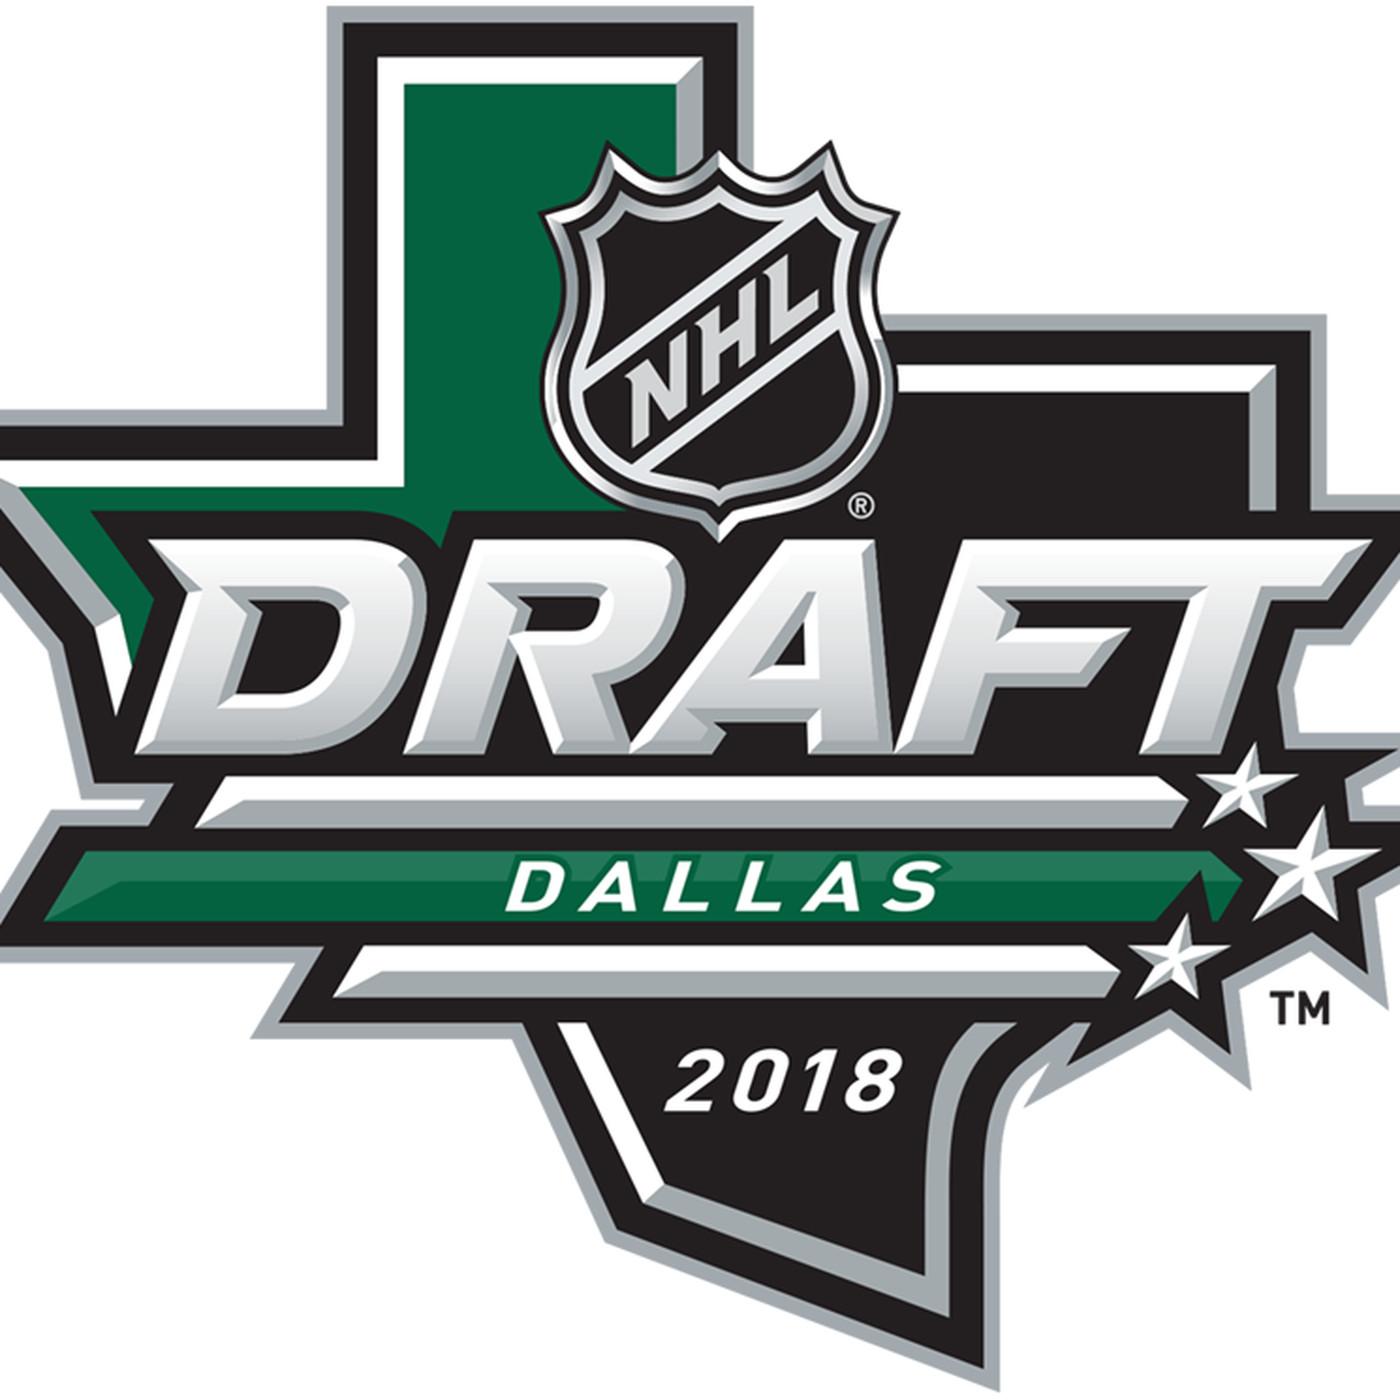 db3510883 2018 NHL MOCK DRAFT  Islanders Take forward Jesperi Kotkaniemi with first  of back-to-back picks - Hockey Wilderness